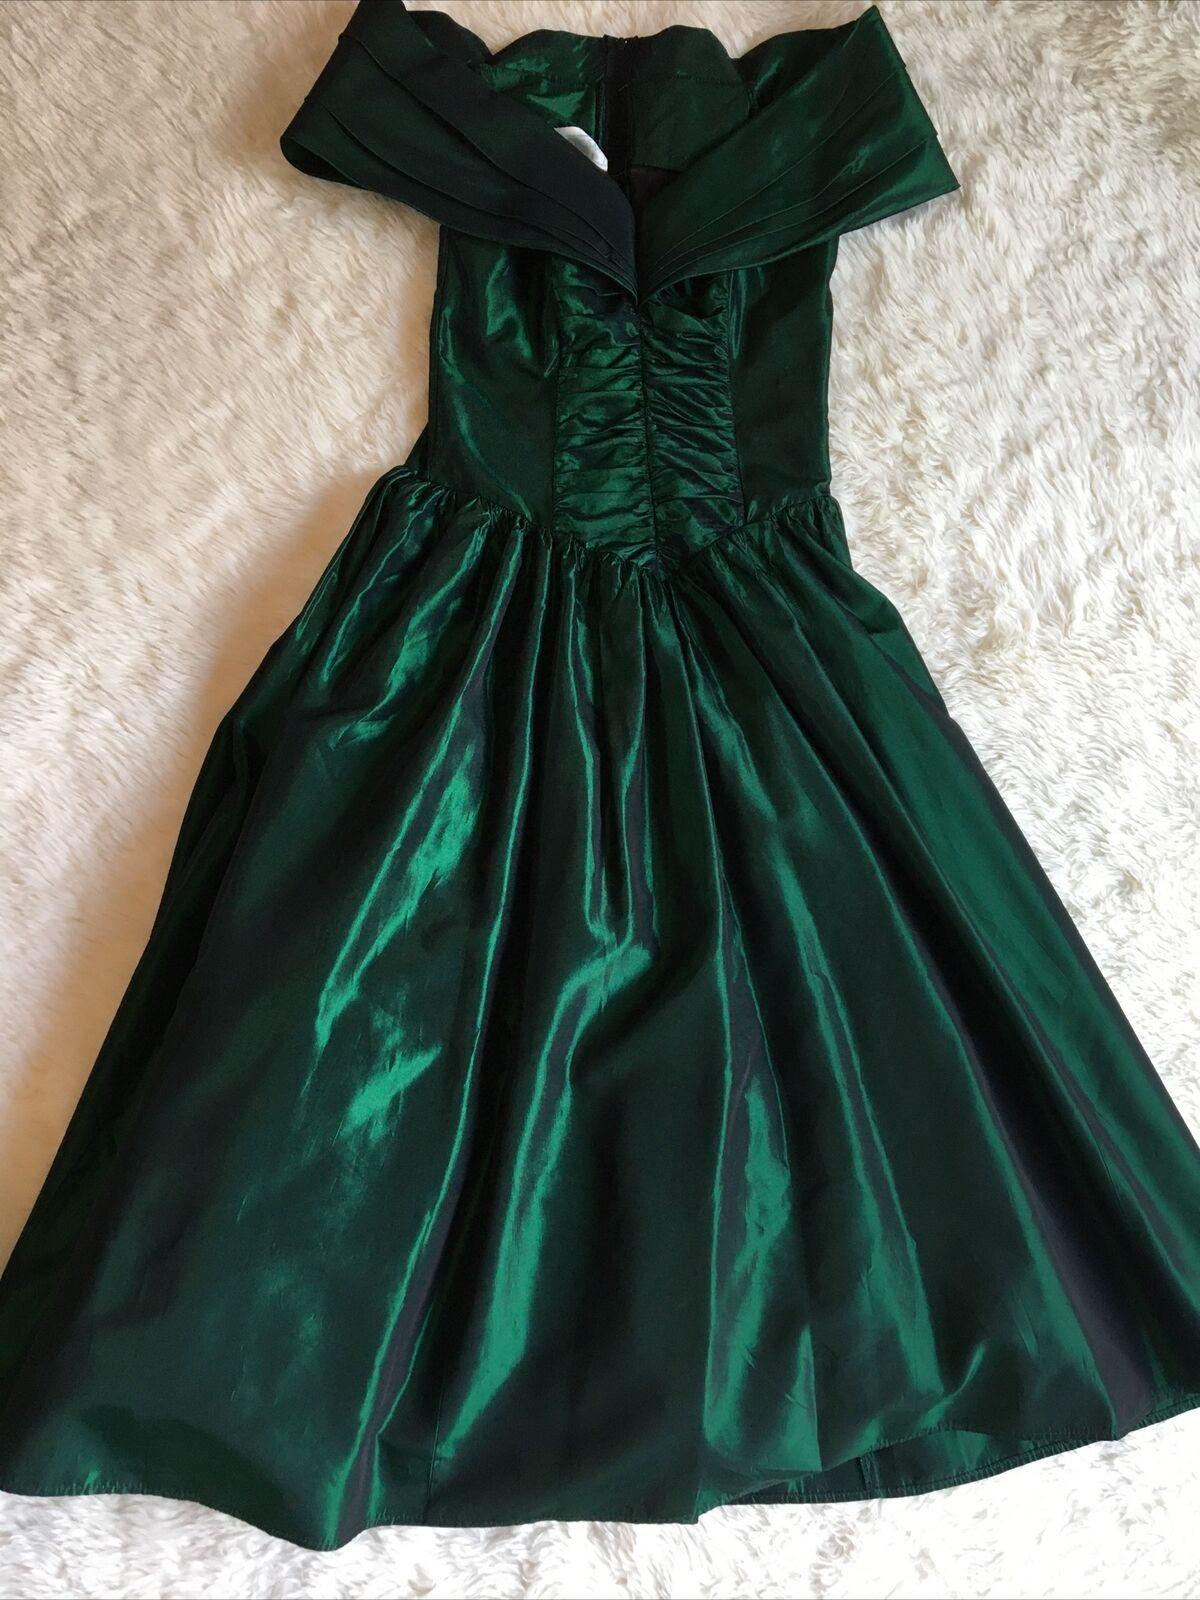 vintage jessica mcclintock gunne sax dress 80s Wo… - image 2